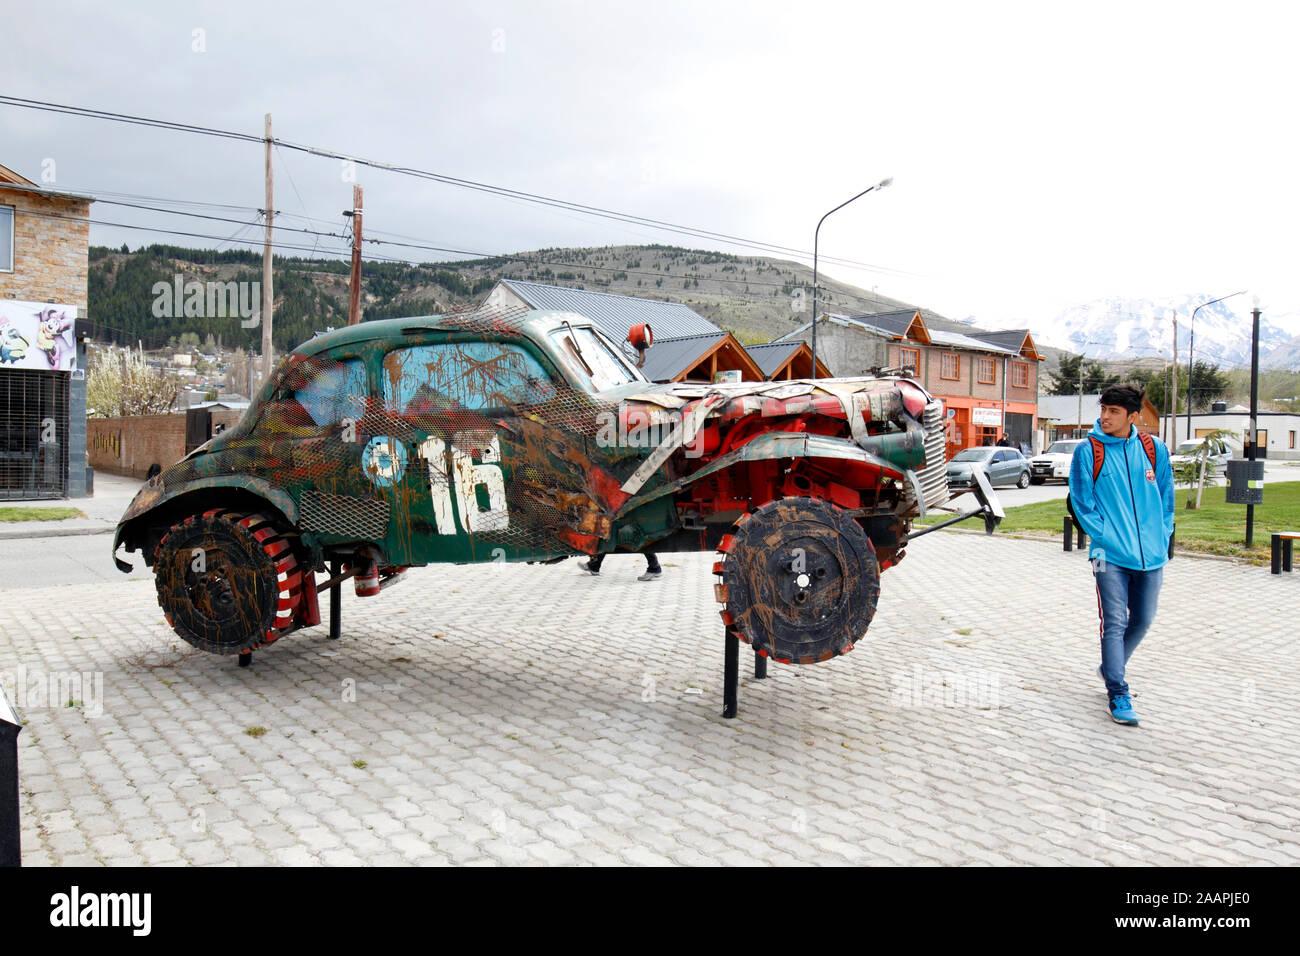 1940 Chevrolet Denkmal für die Gran Premio del Sur 1942 in Argentinien. Stockfoto